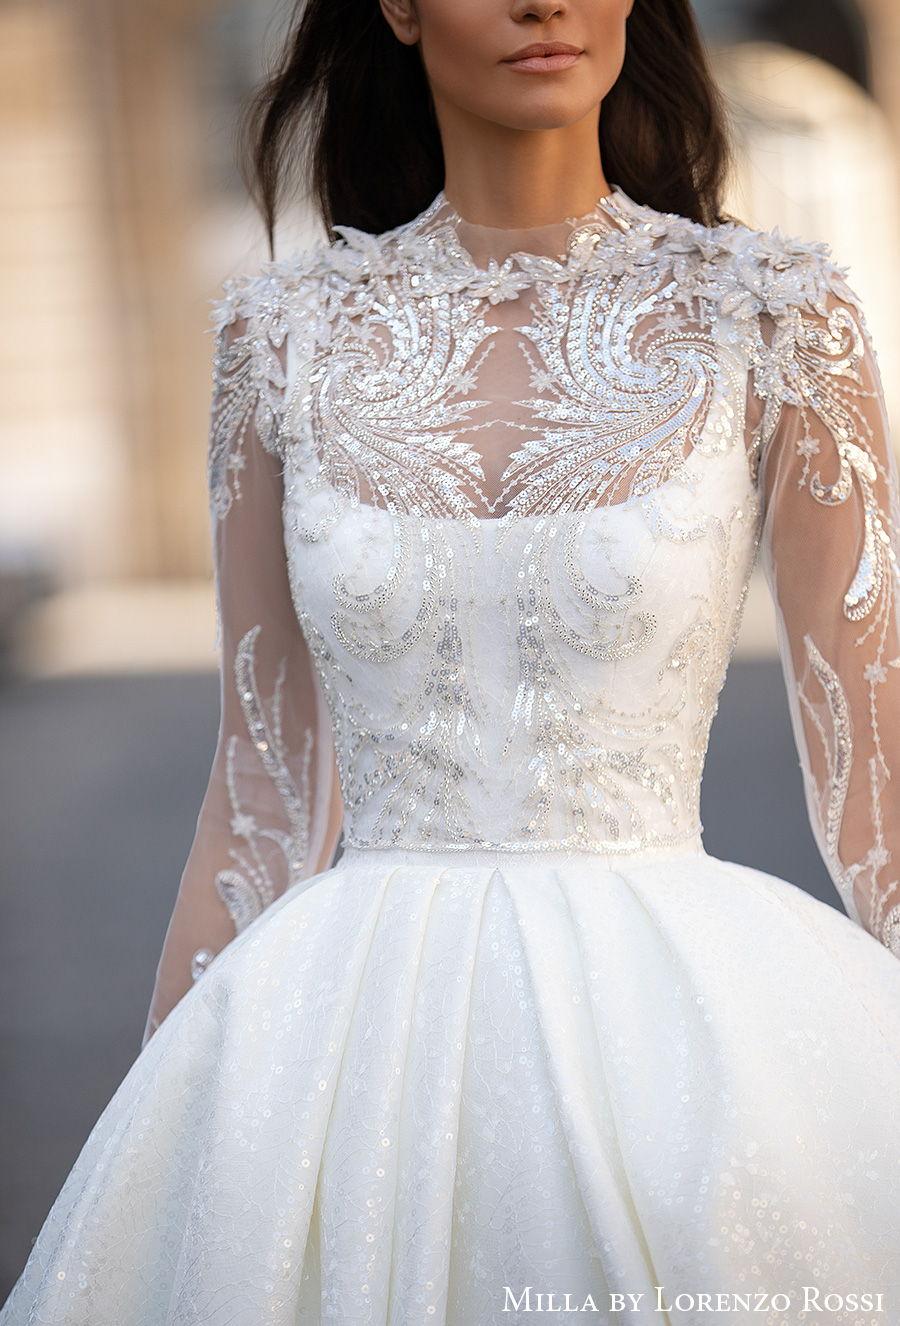 milla lorenzo rossi 2021 bridal logn sleeves jewel neck heavily embellished bodice elegant ball gown a  line wedding dress mid back chapel train (gabrielle) mv